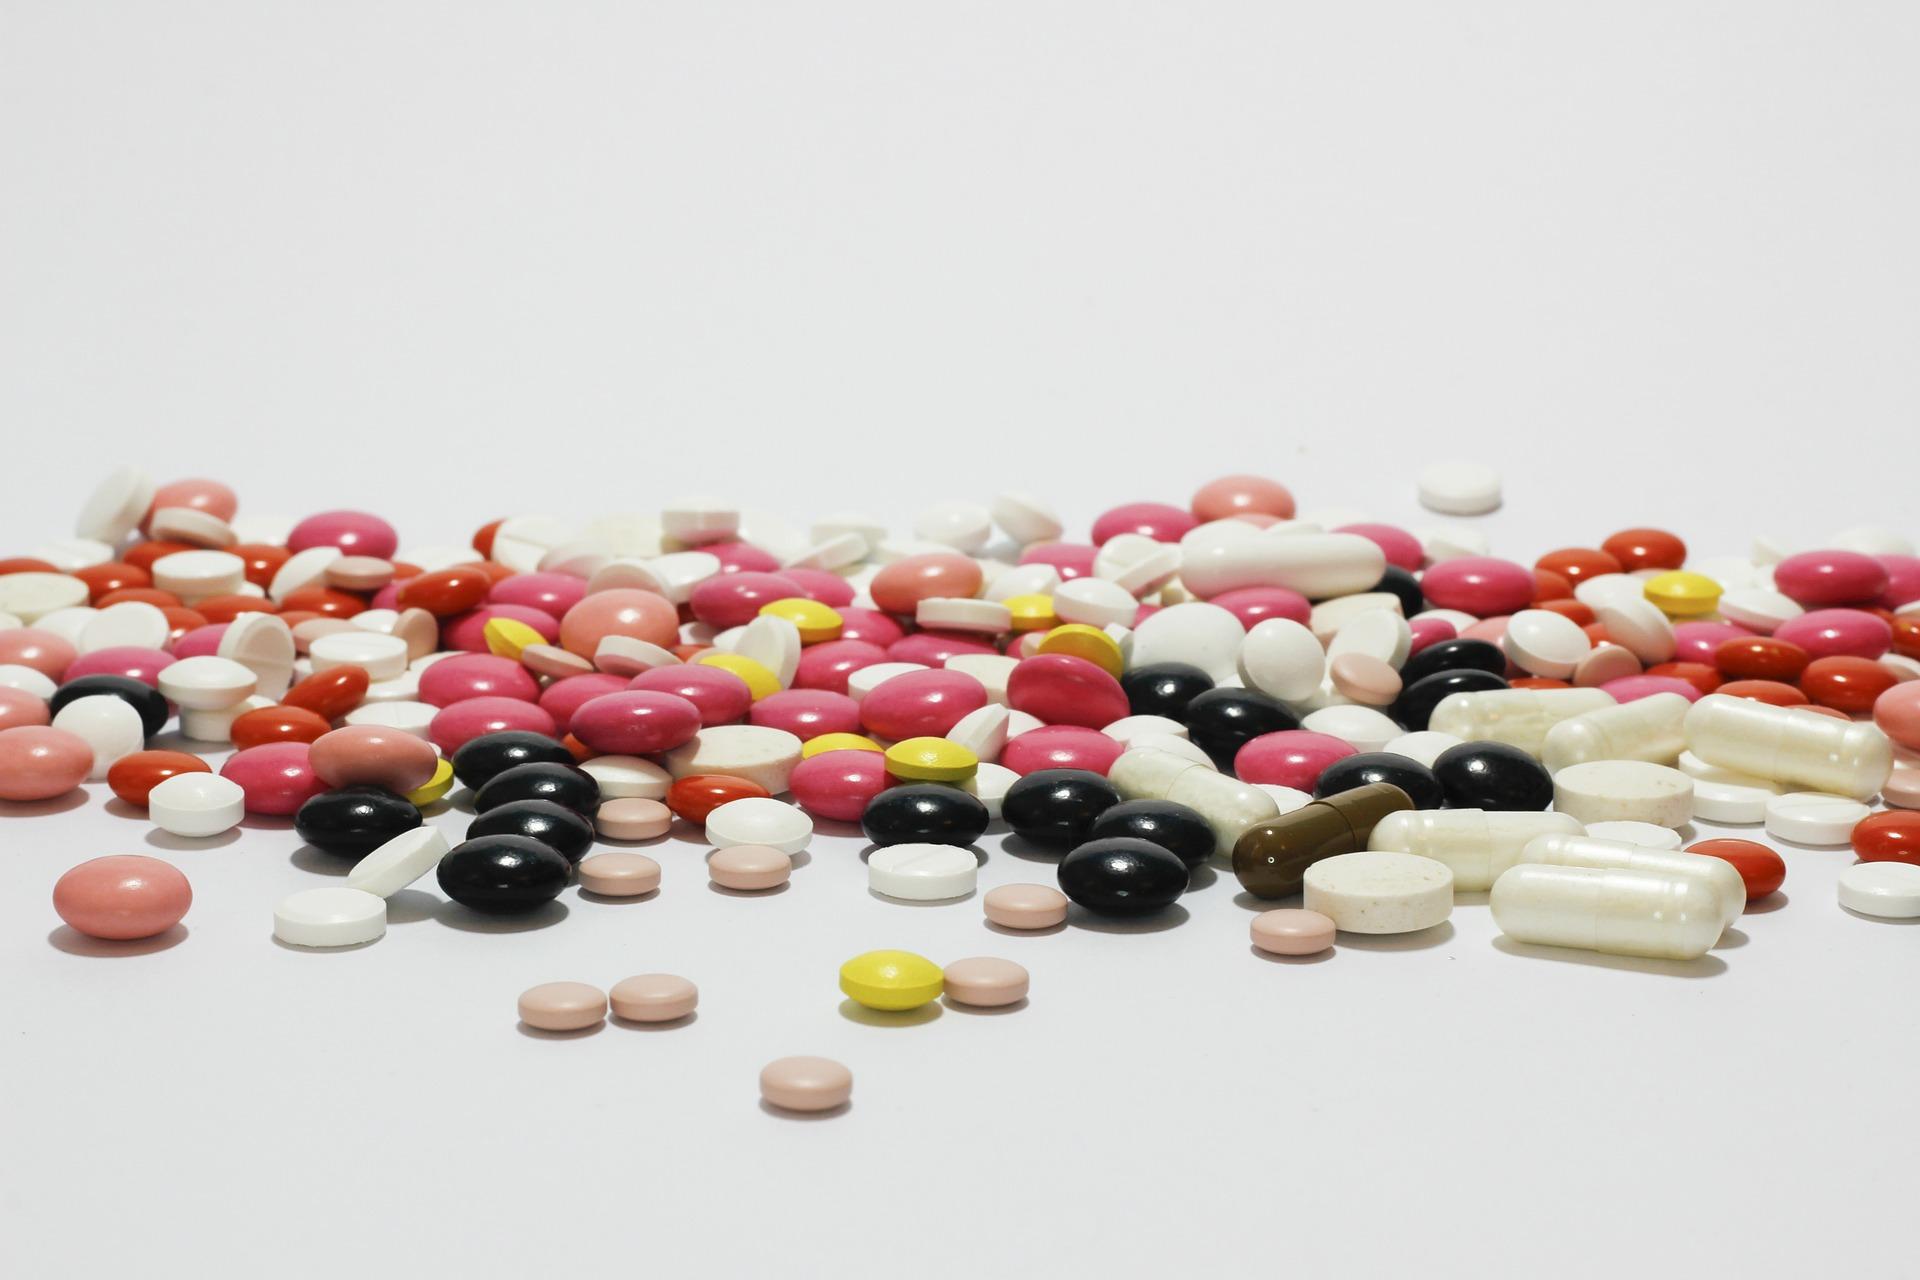 medications-342458_1920